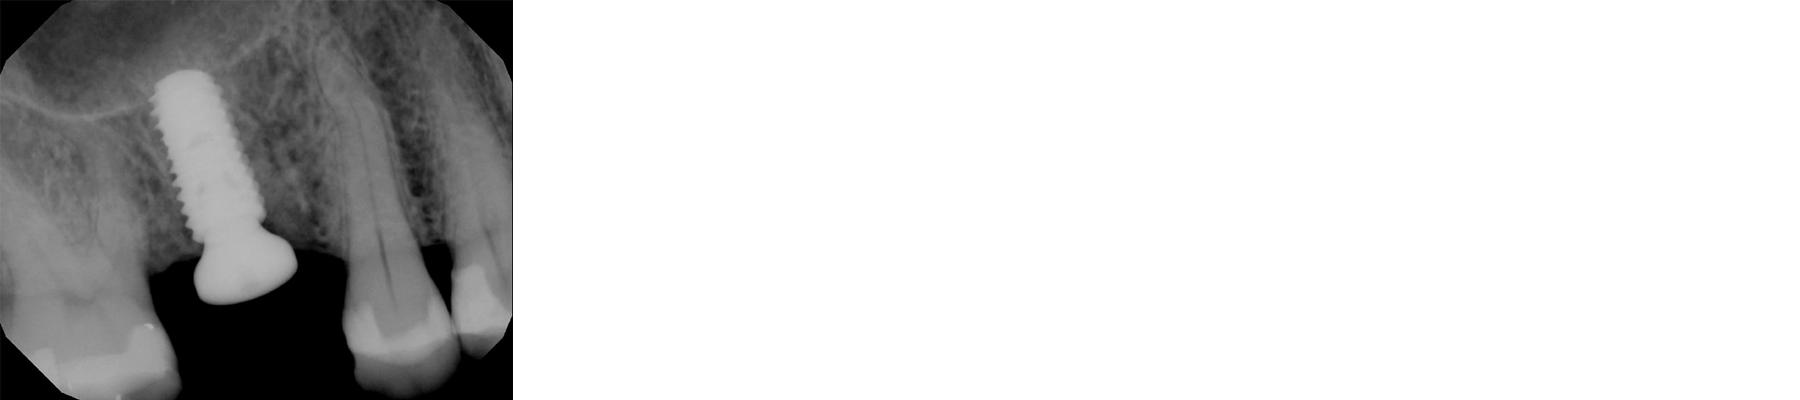 Post-operative-periapical-radiograph